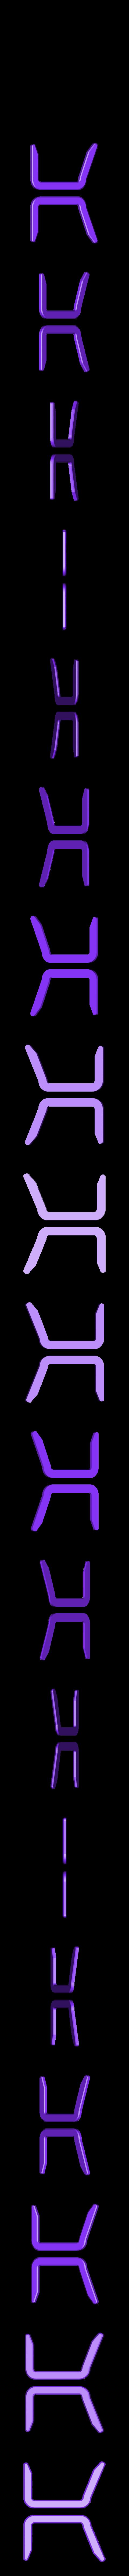 Side Parts.stl Download 3DS file RETRO CAMERA FLOWERPOT • 3D printer template, tolgaaxu